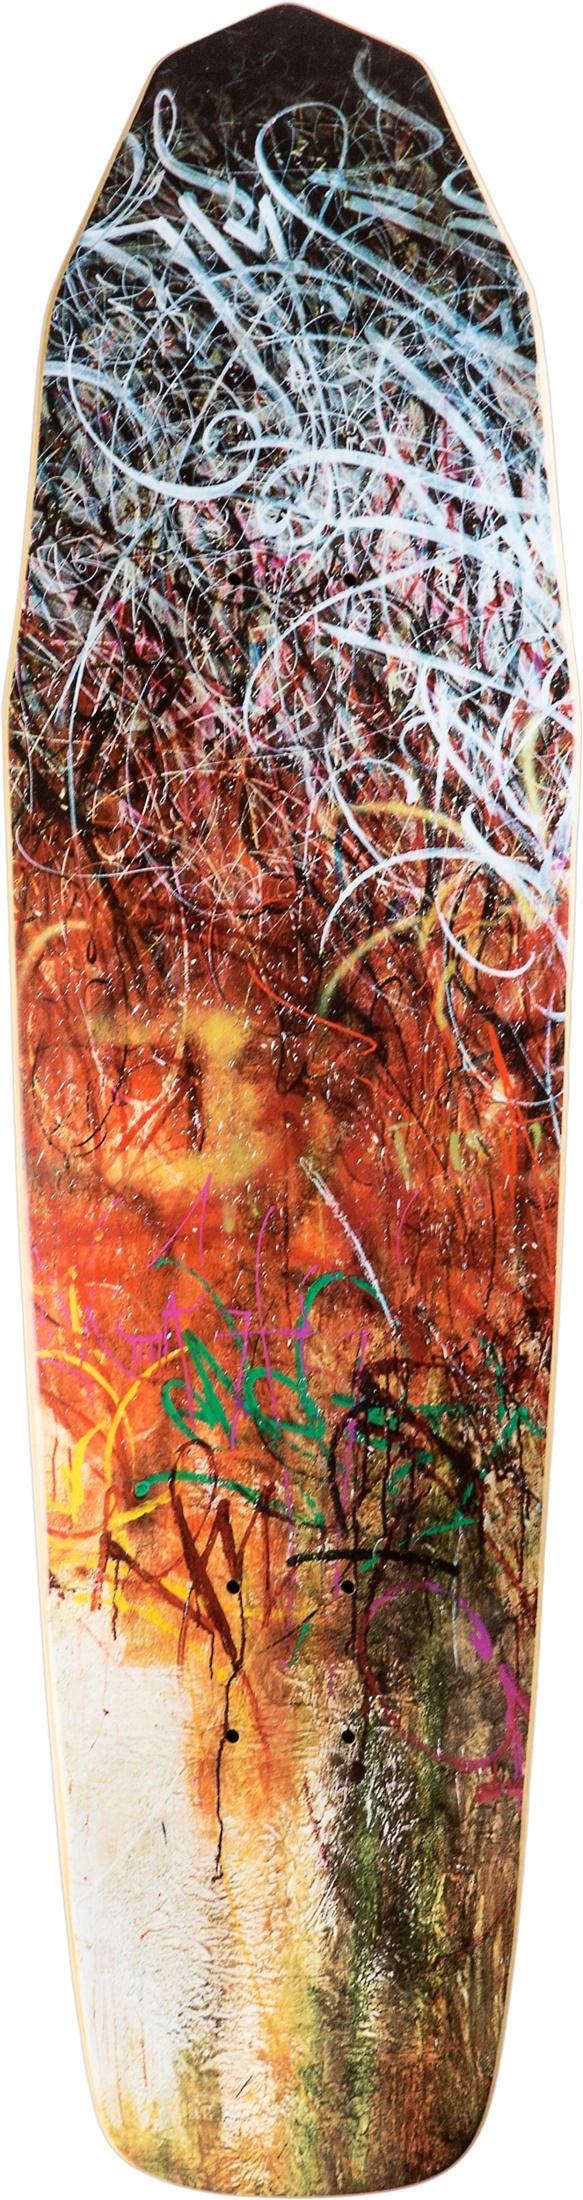 Jose Parla #skateboard #sk8 #art #streetart #skatedeck #deck #contemporaryart #sk8life #skate #urbanart